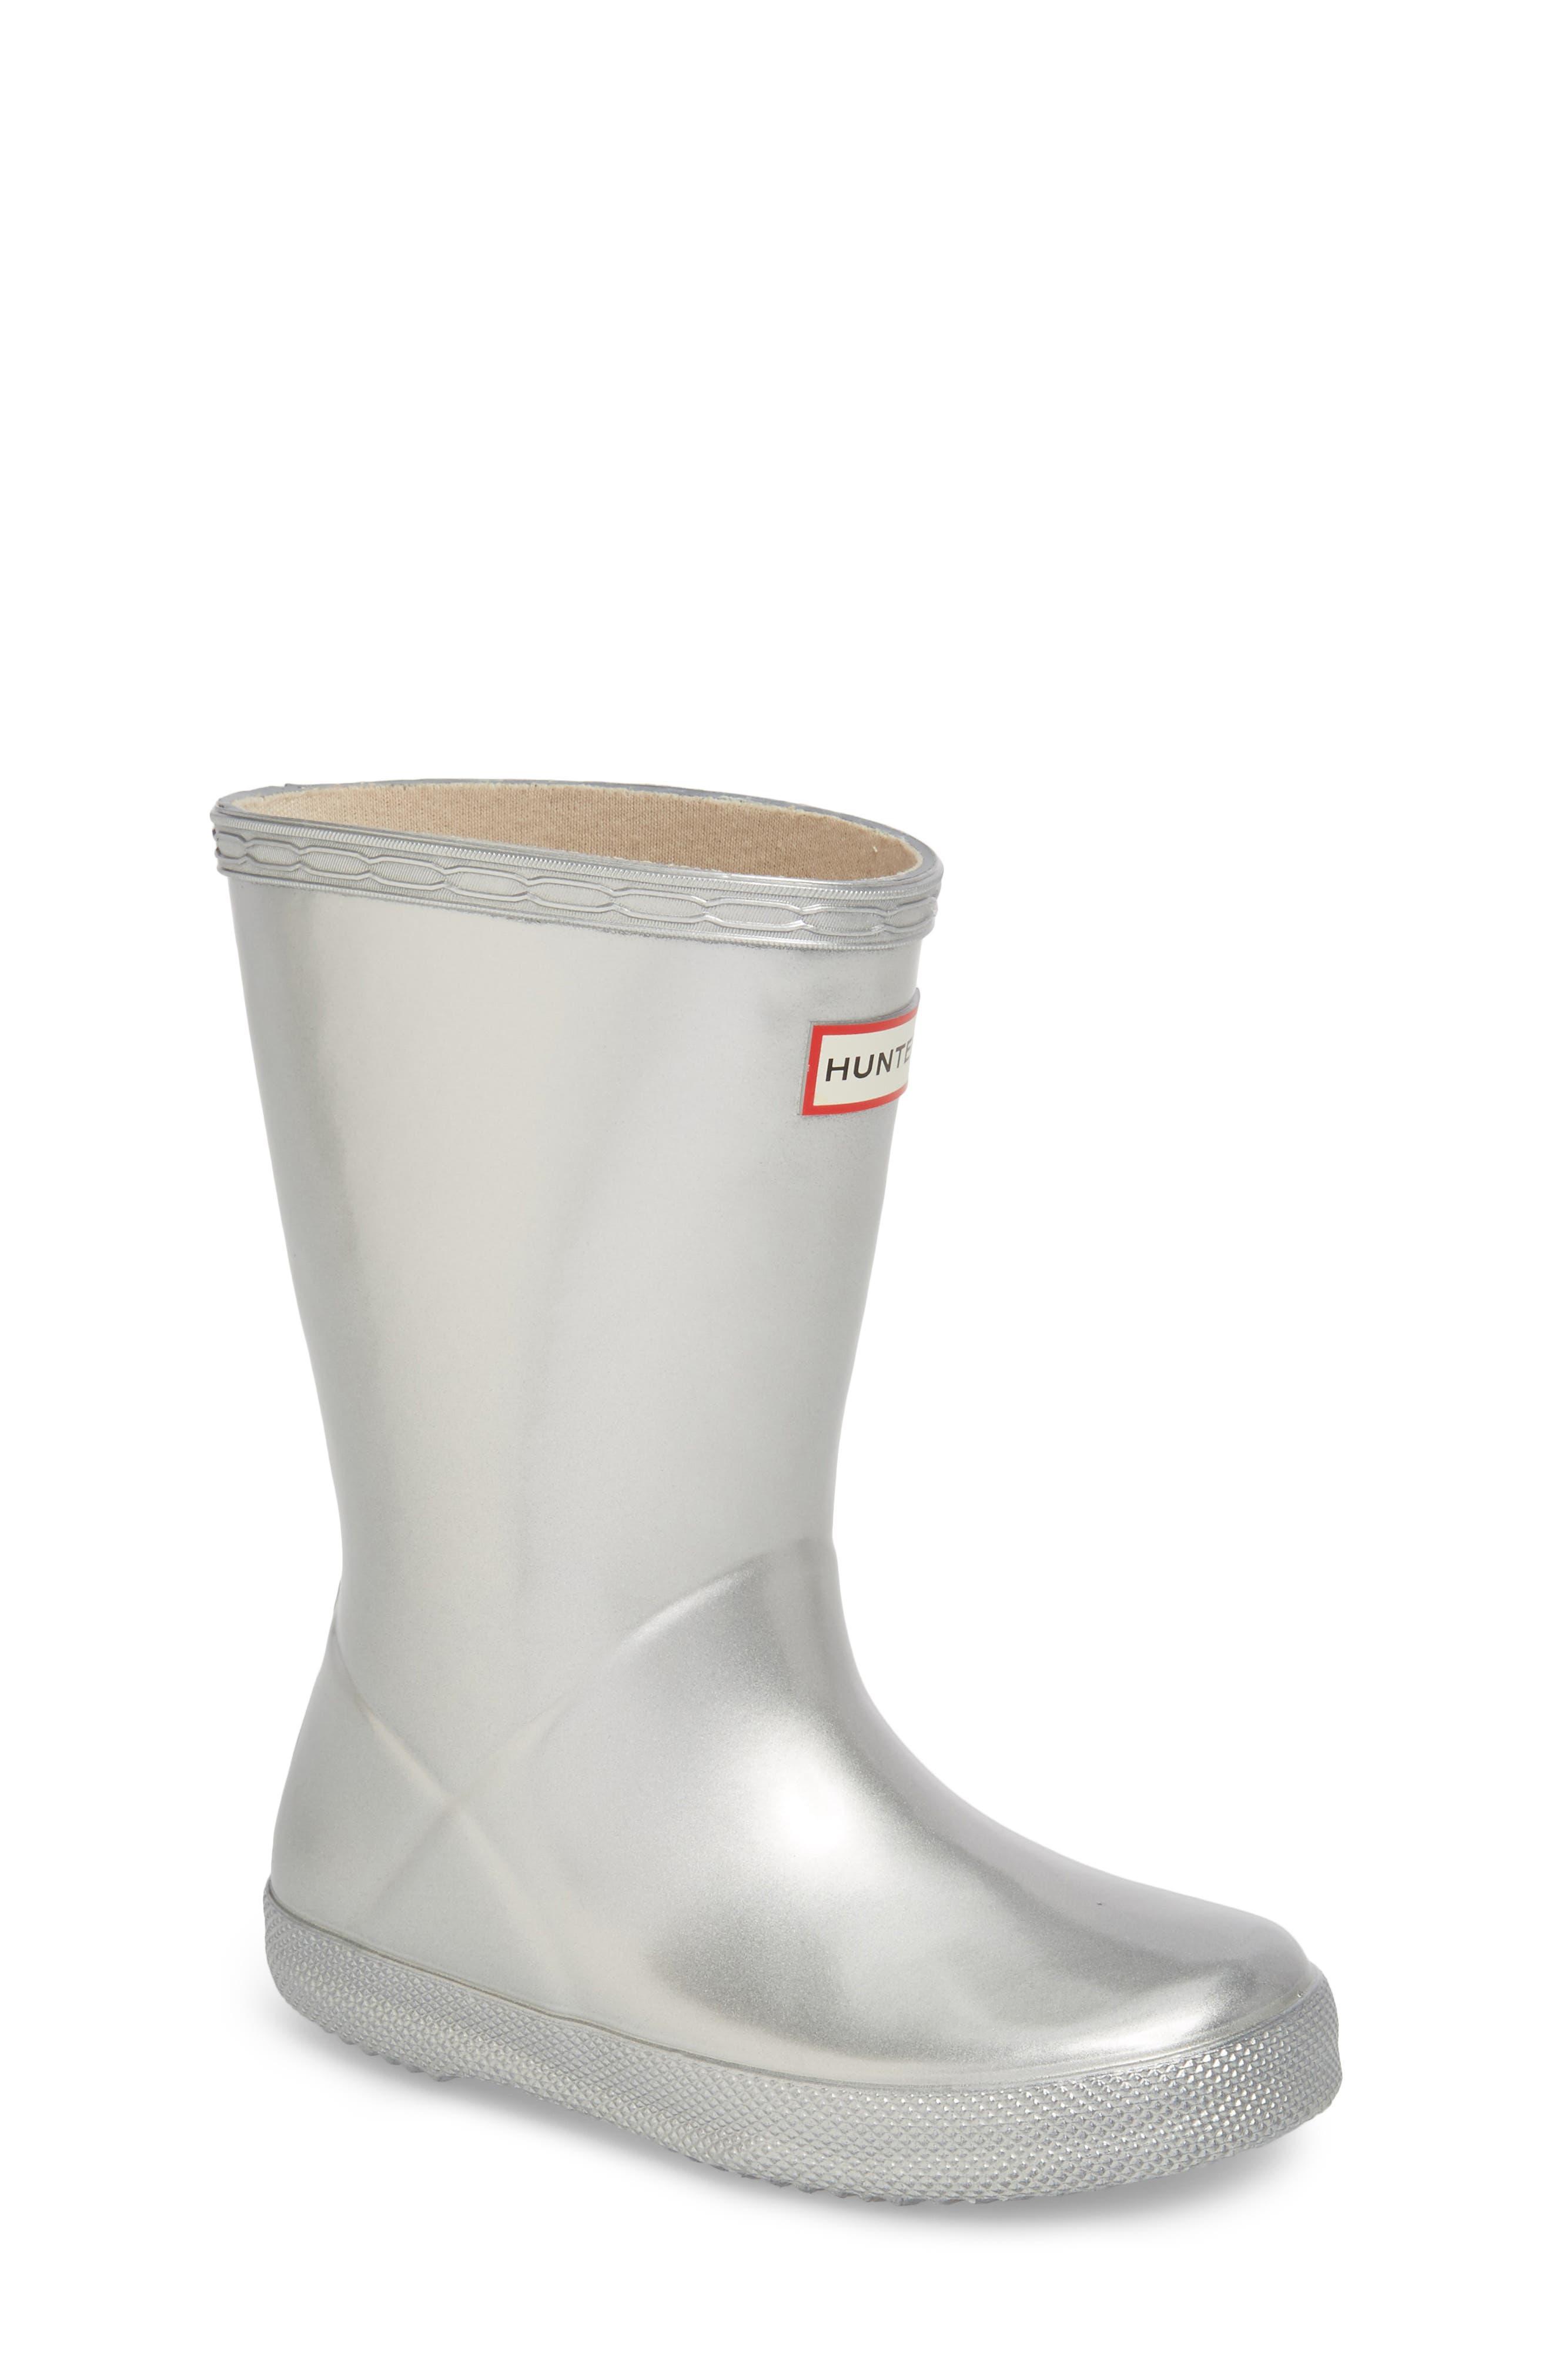 HUNTER,                             First Classic Metallic Waterproof Rain Boot,                             Main thumbnail 1, color,                             SILVER